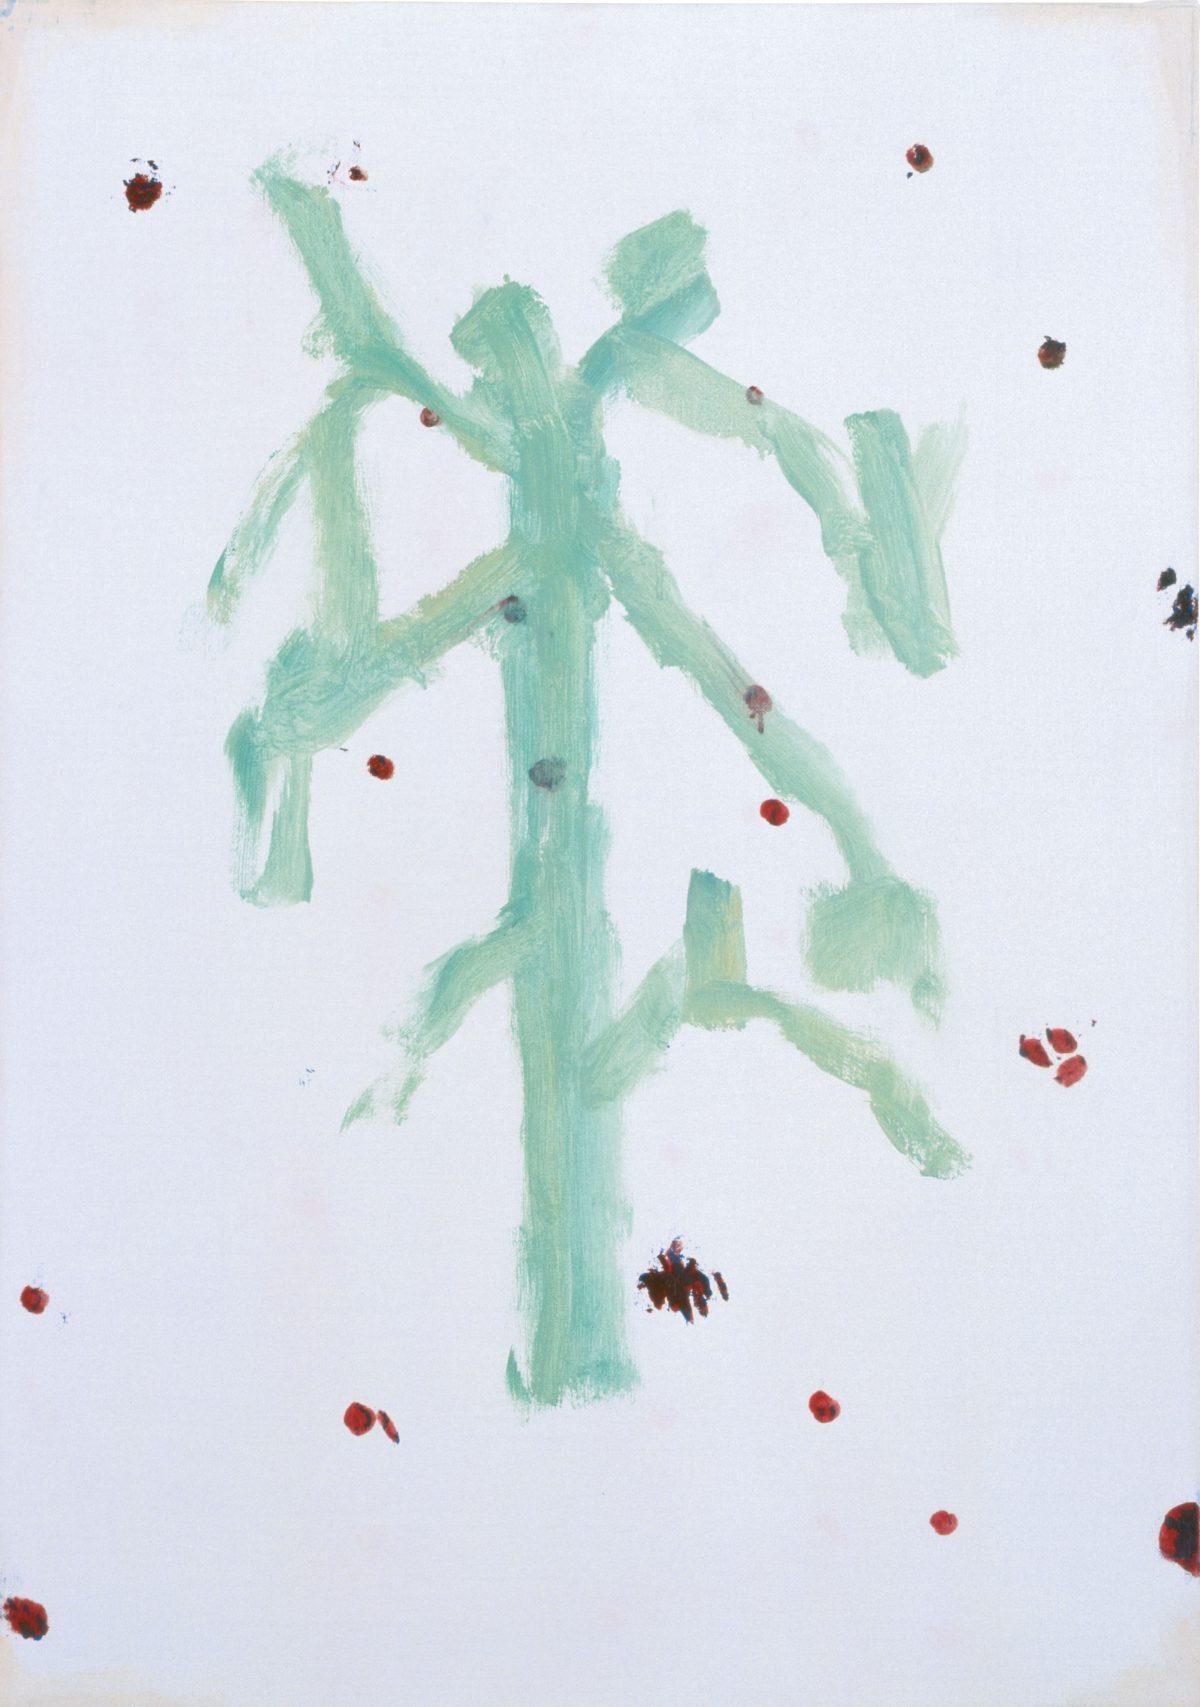 Raoul De Keyser, Séjour, 2001 Öl auf Leinwand, 71 x 50 cm © Familie Raoul De Keyser   SABAM Belgien 2018, Sammlung Jin Sato, Foto: Felix Tirry